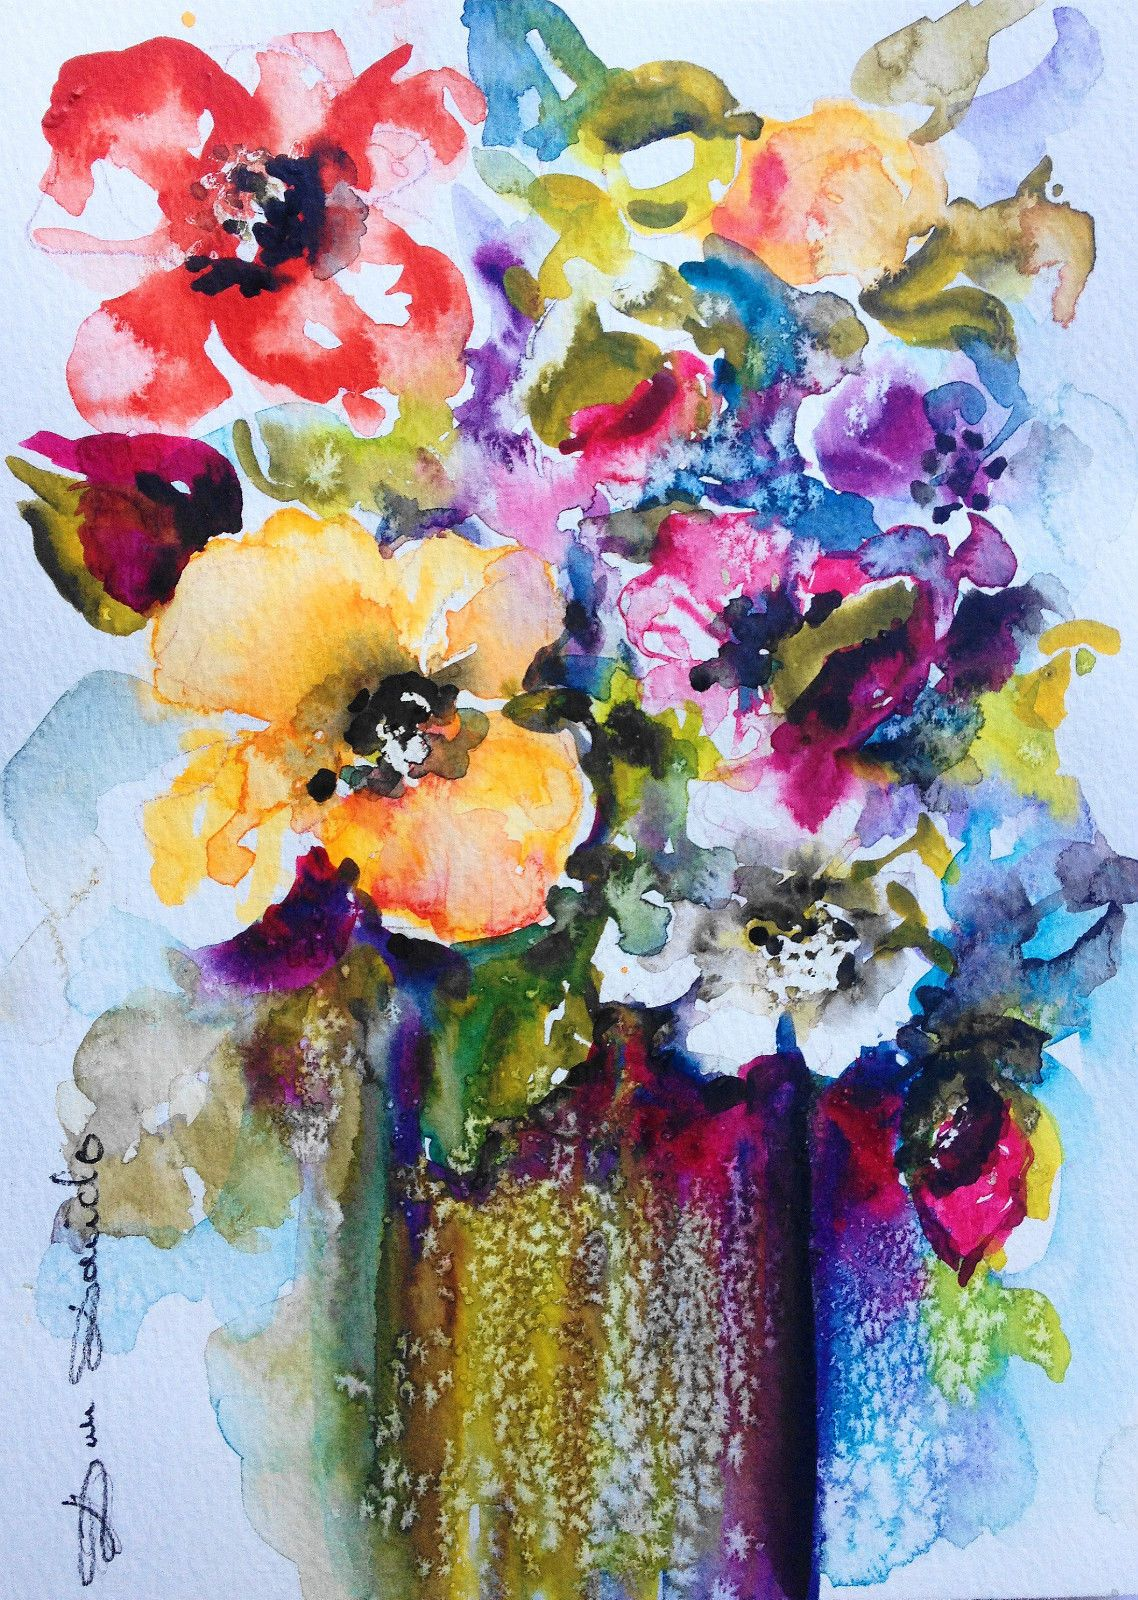 aquarelle originale fleur roses sauvages cynorrhodons. Black Bedroom Furniture Sets. Home Design Ideas